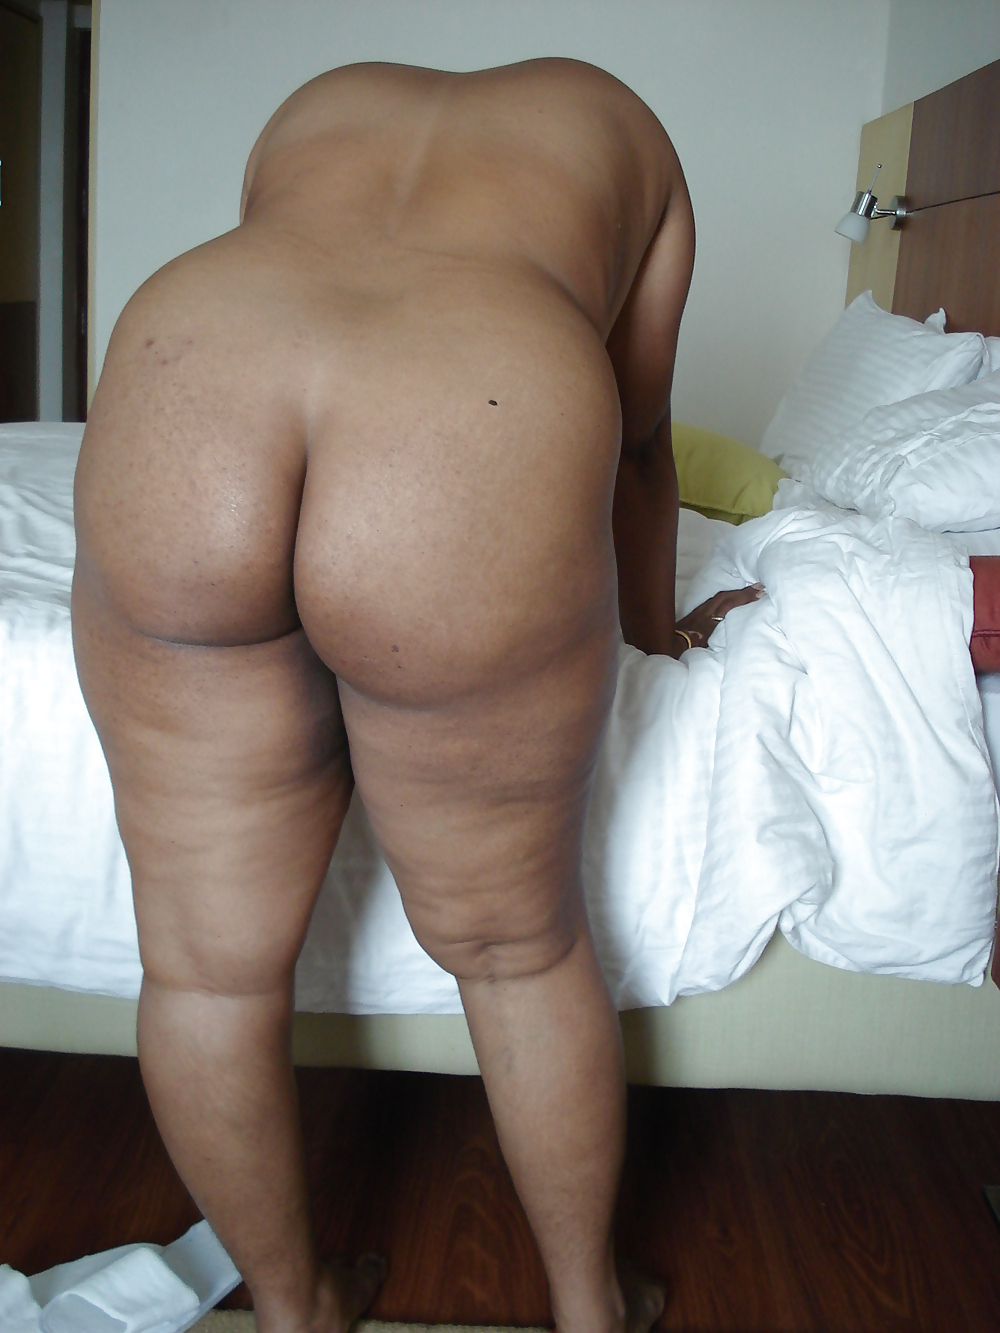 Desi Big ass-Bengali boro putki 4 Porn Pics #18874620